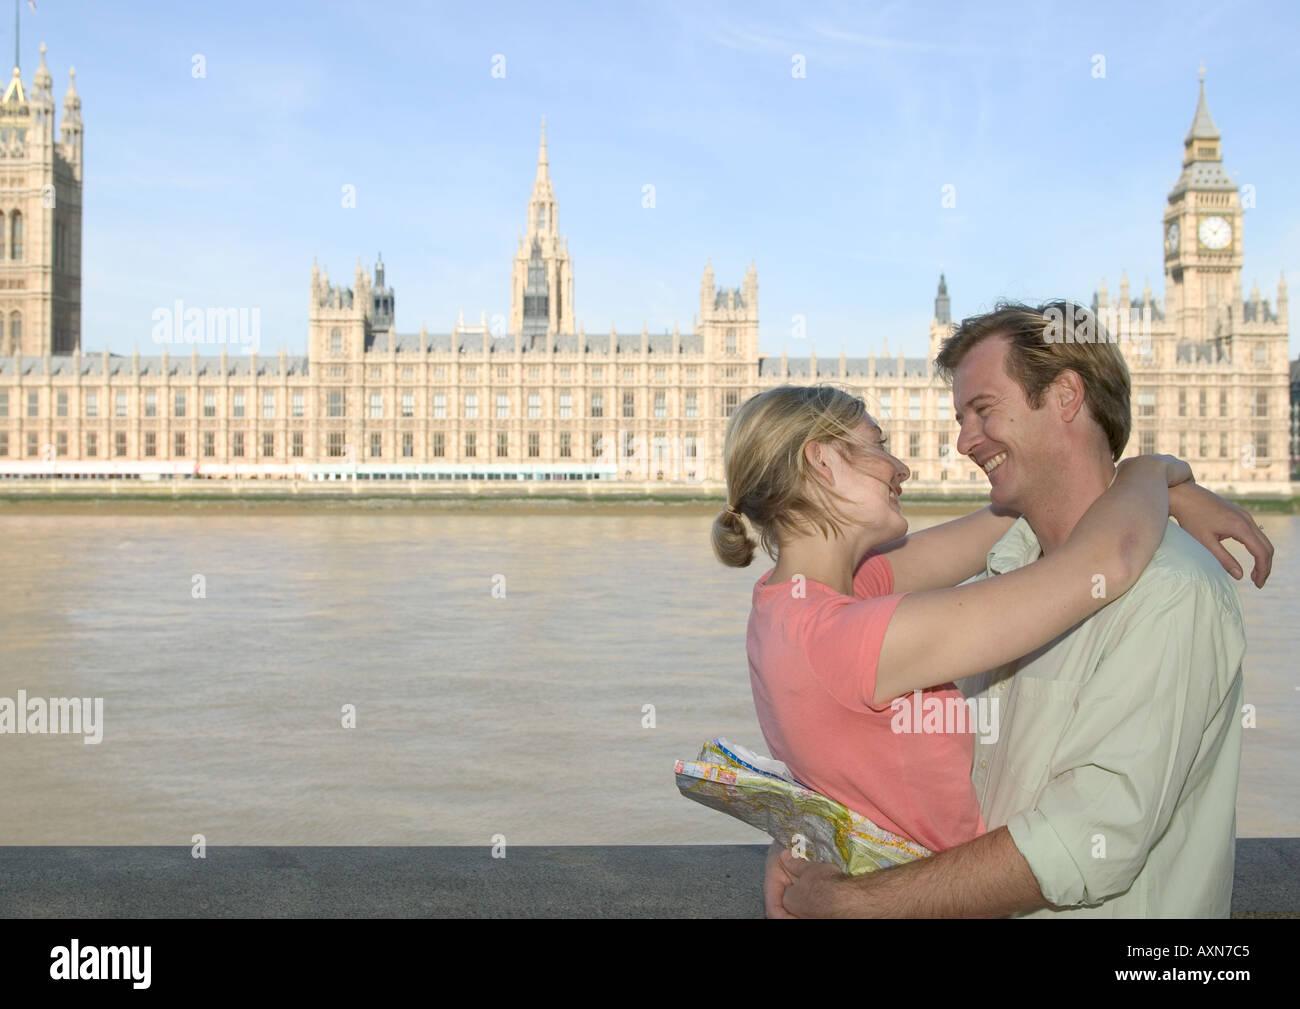 young couple embracing on short break in london opposite big ben - Stock Image